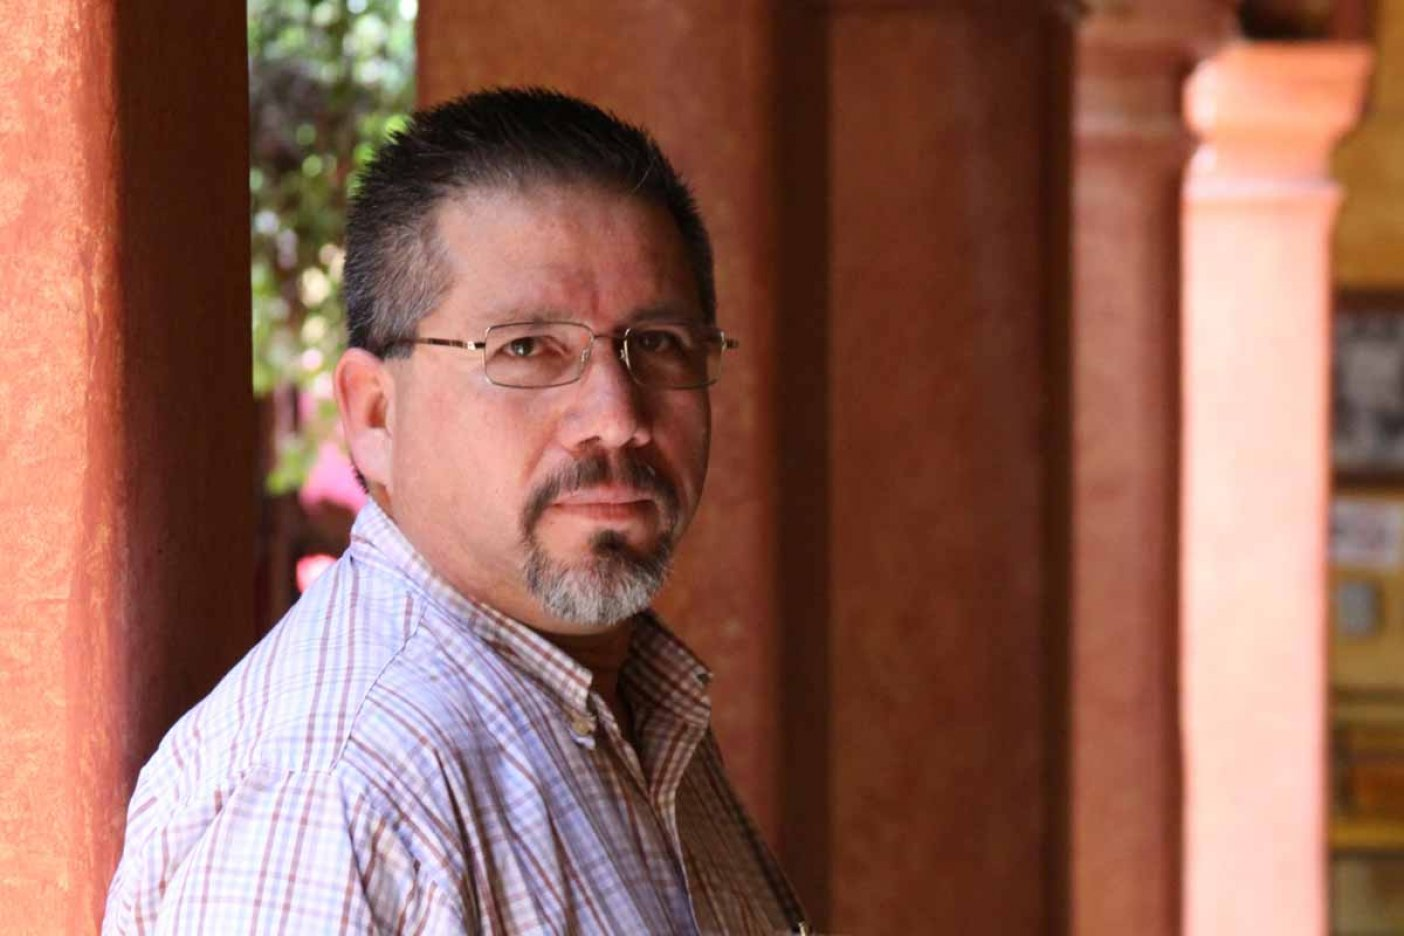 Conmemoran tres meses del asesinato del periodista Javier Valdez